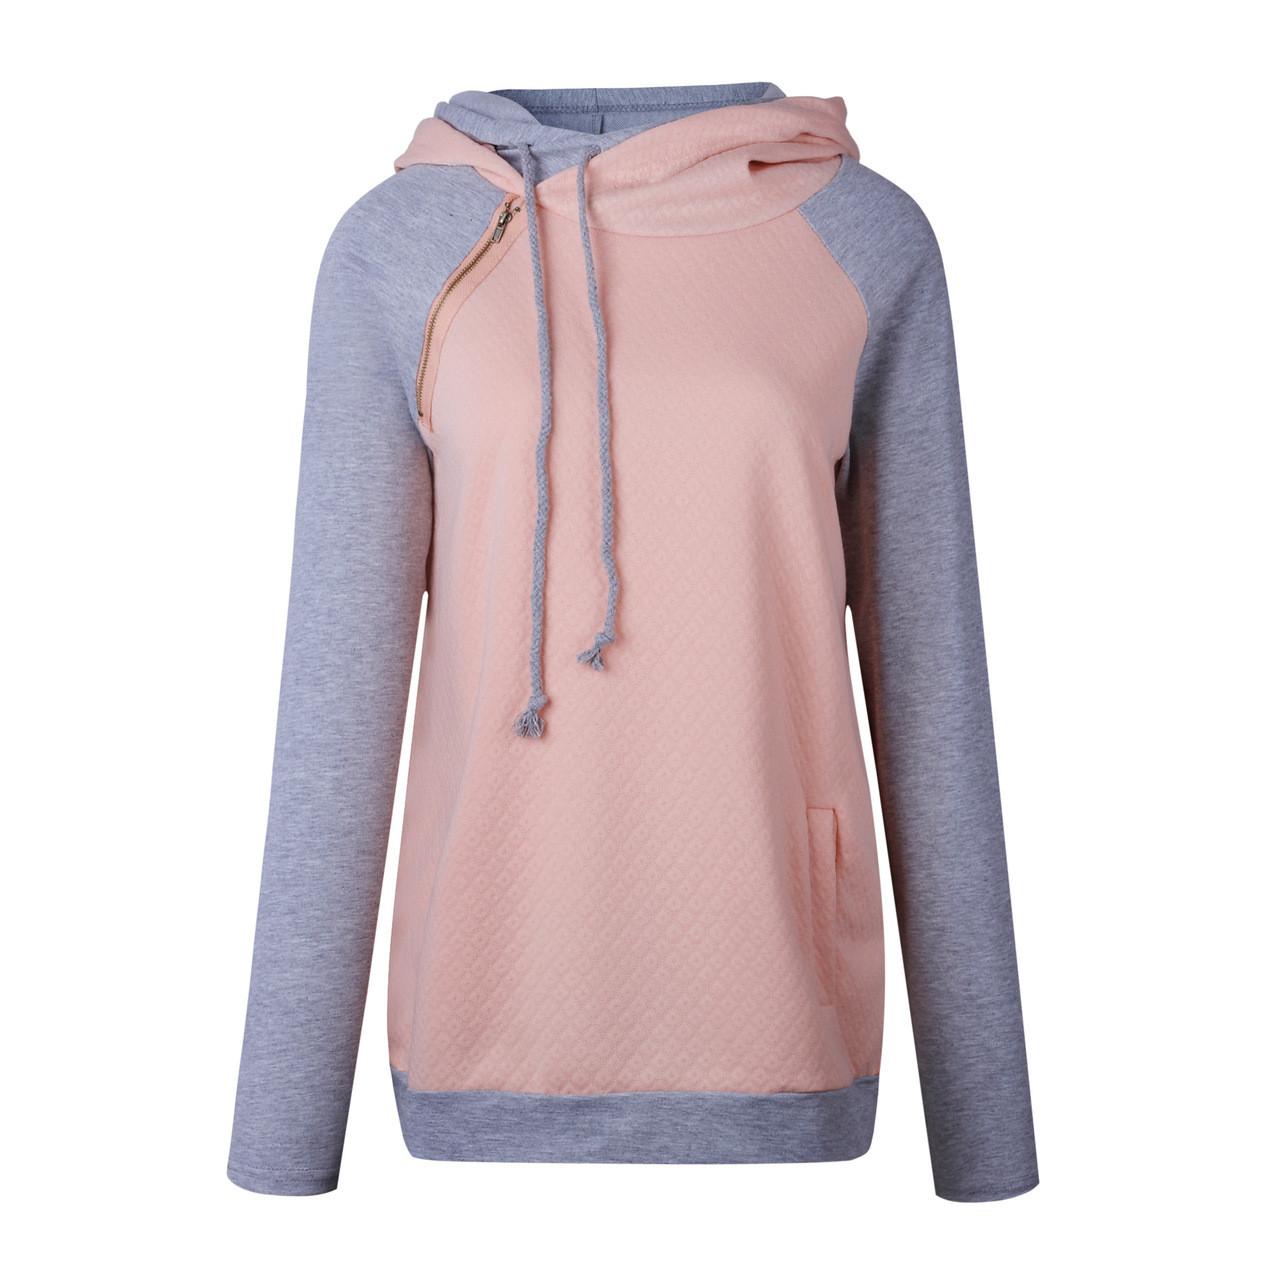 4244b63e877 ... Oversize Hoodies Sweatshirts Women Pullover Hoodie Female Patchwork  Double Hood Hooded Sweatshirt Autumn Coat Warm Hoody ...